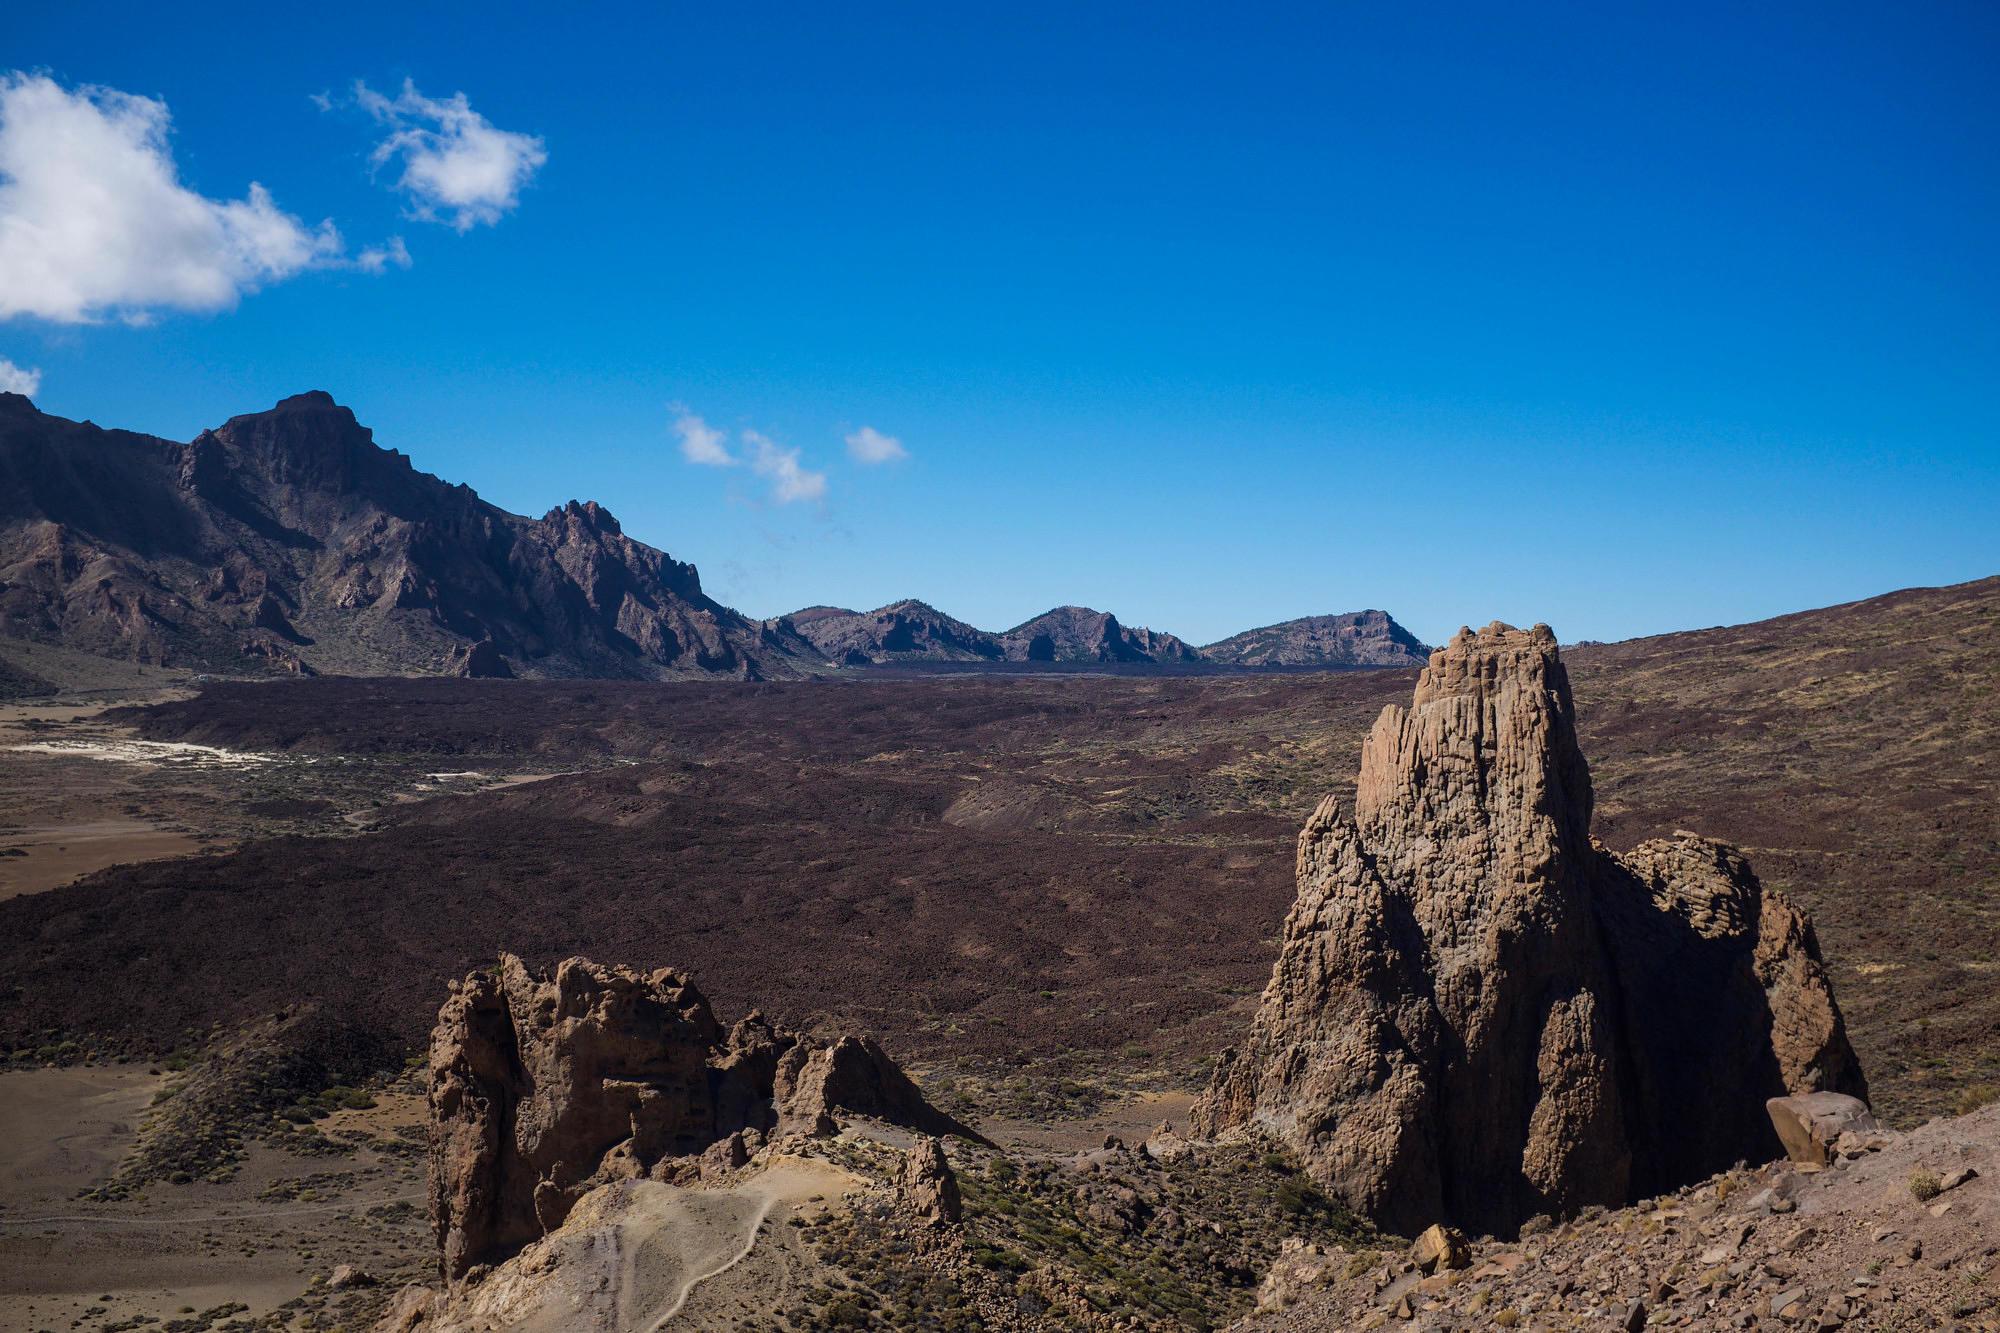 Mountain views at the Cañadas del Teide National Park in Tenerife